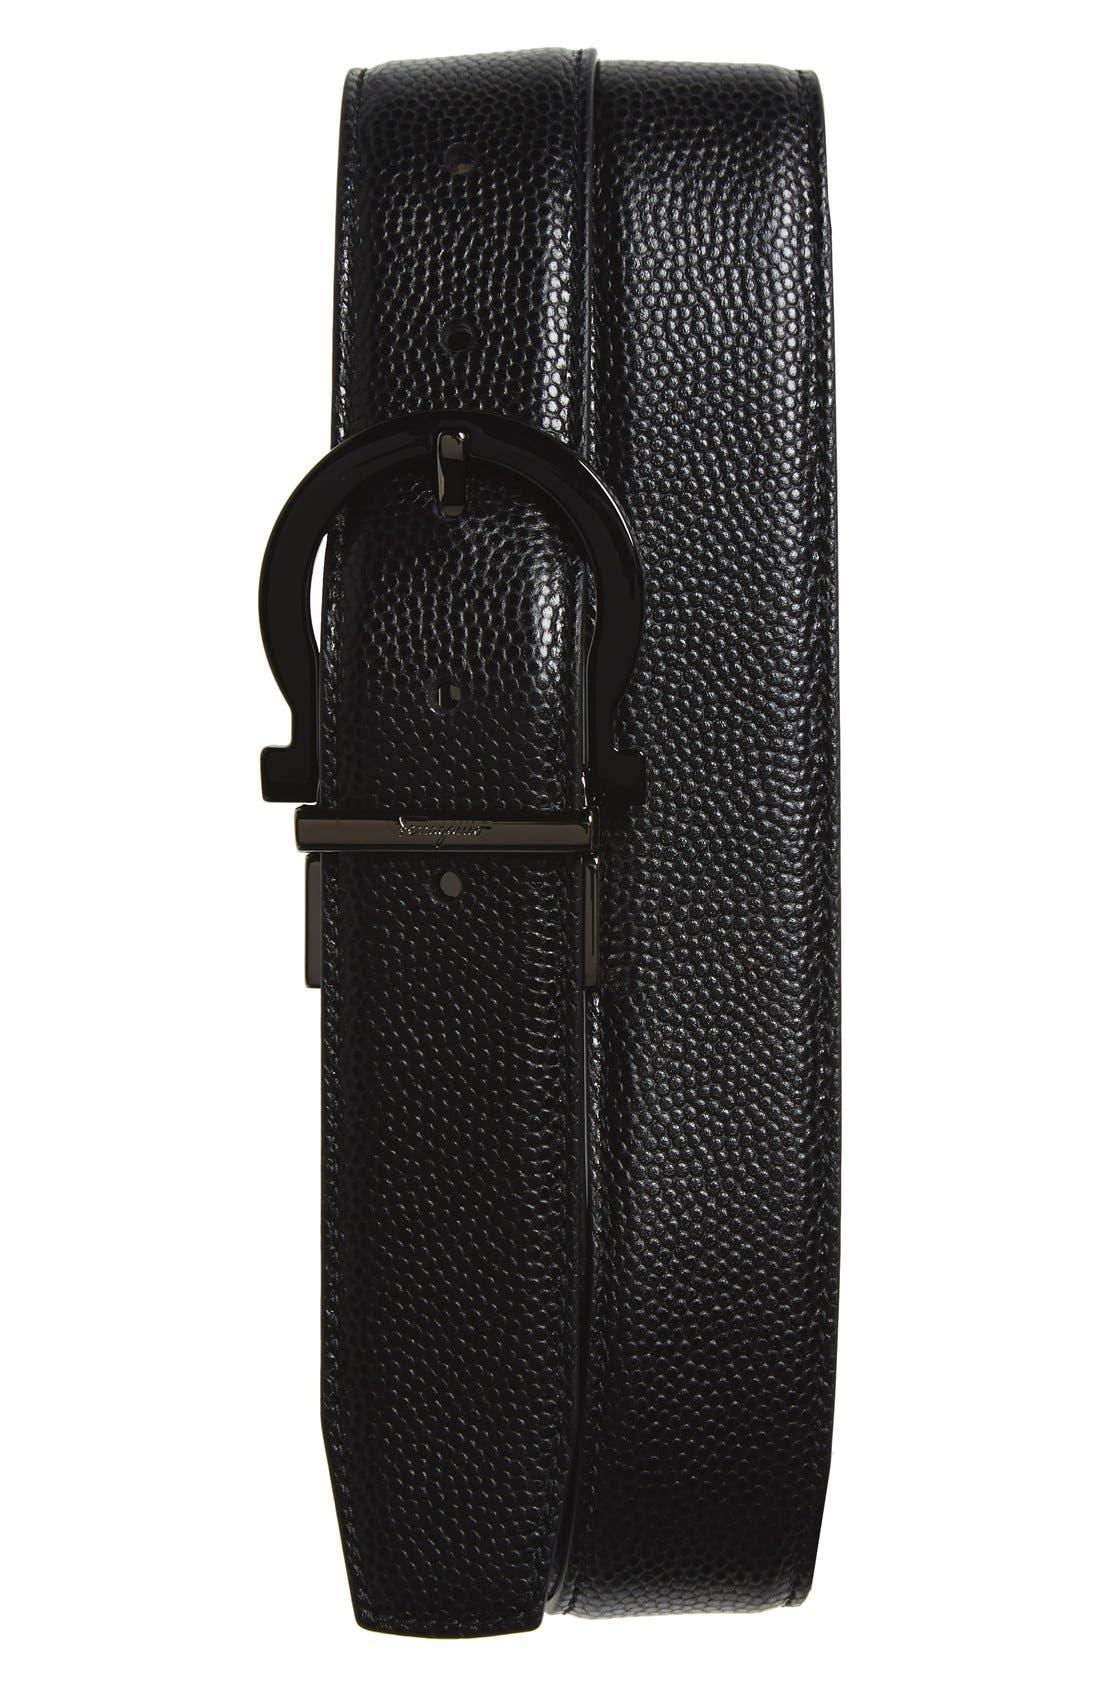 Alternate Image 1 Selected - Salvatore Ferragamo Reversible Calfskin Leather Belt